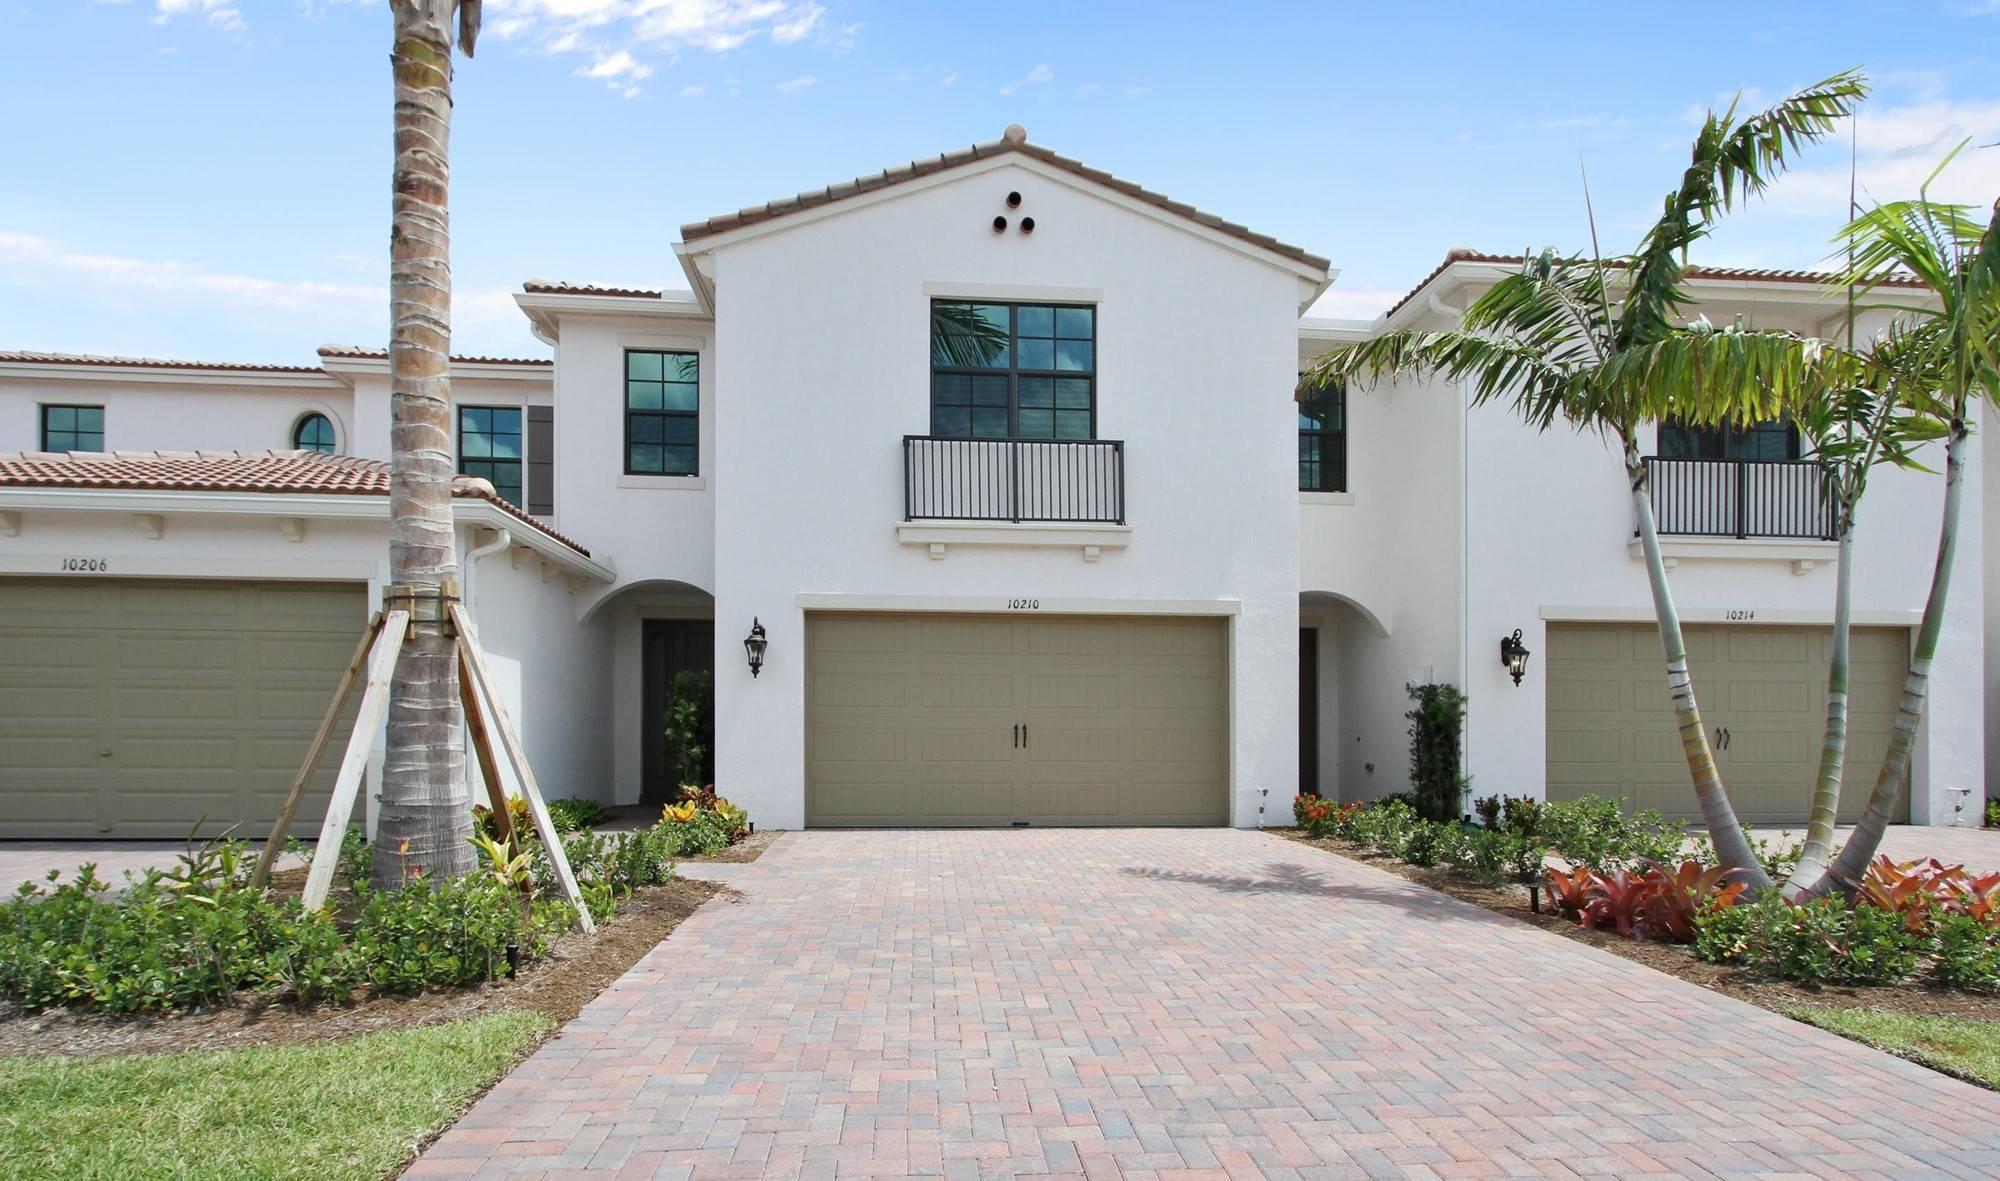 10101  Brickhill Drive 140 For Sale 10660869, FL